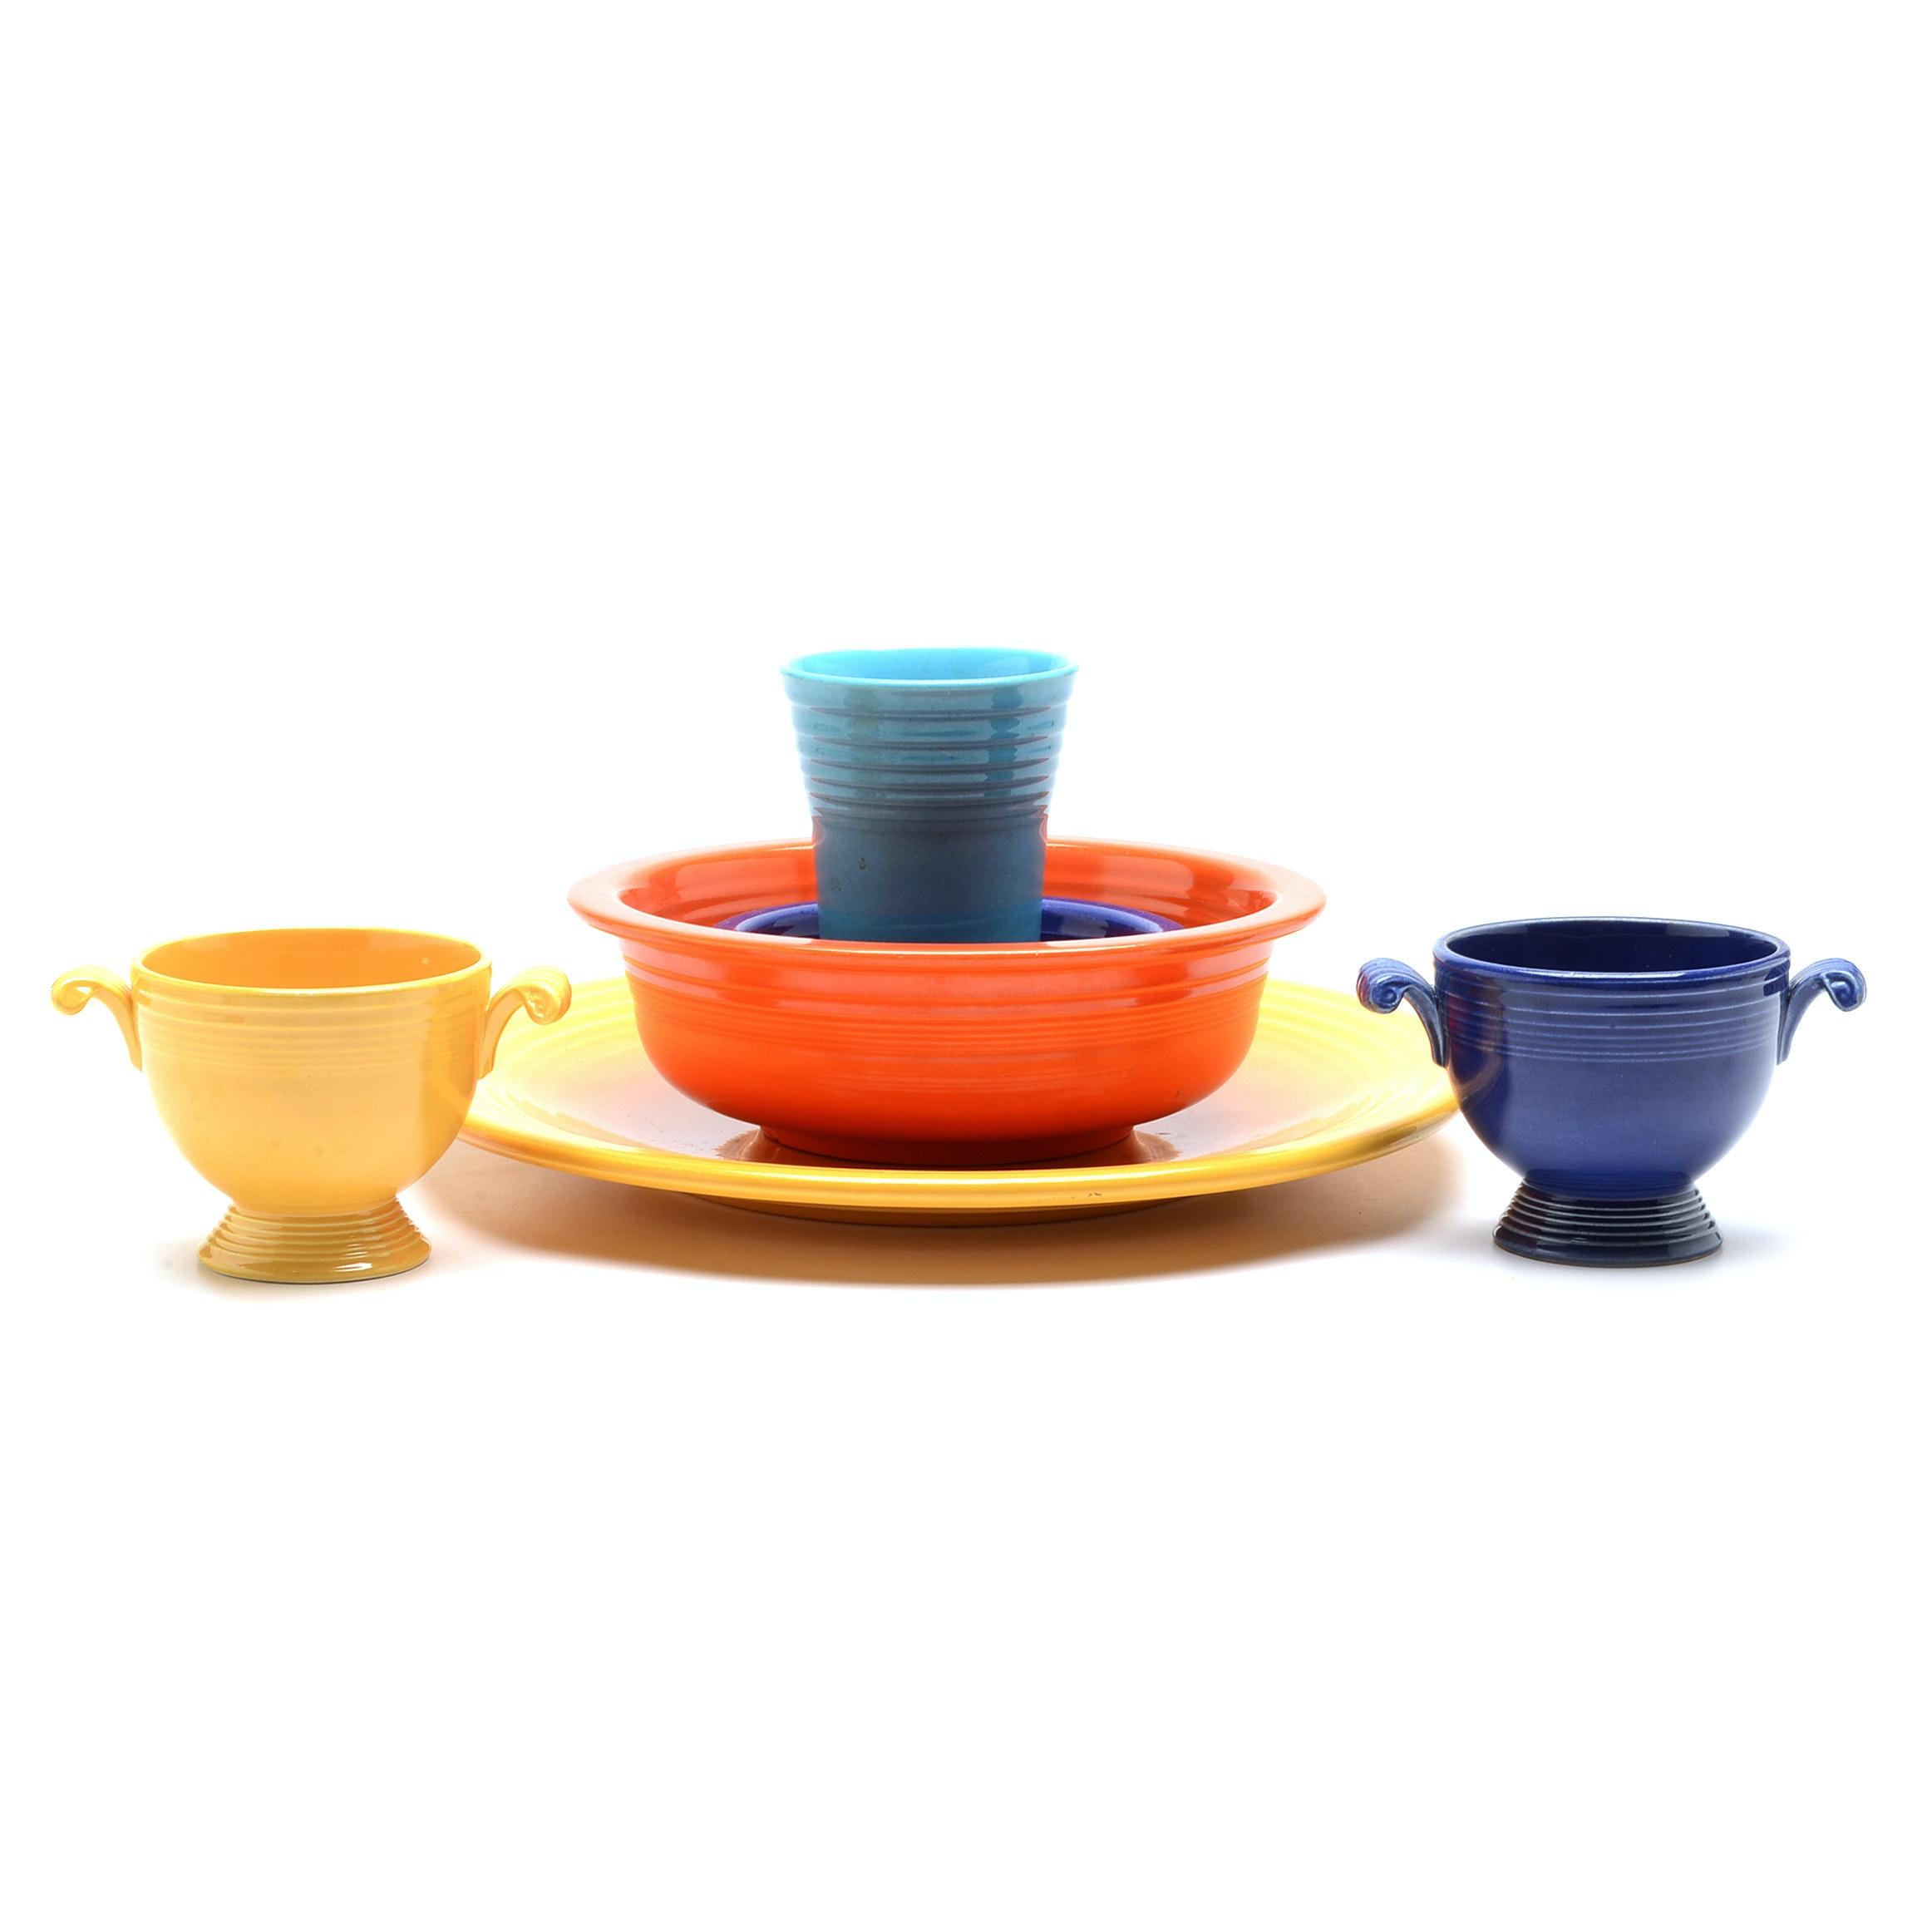 Mixed Group of Vintage Fiestaware